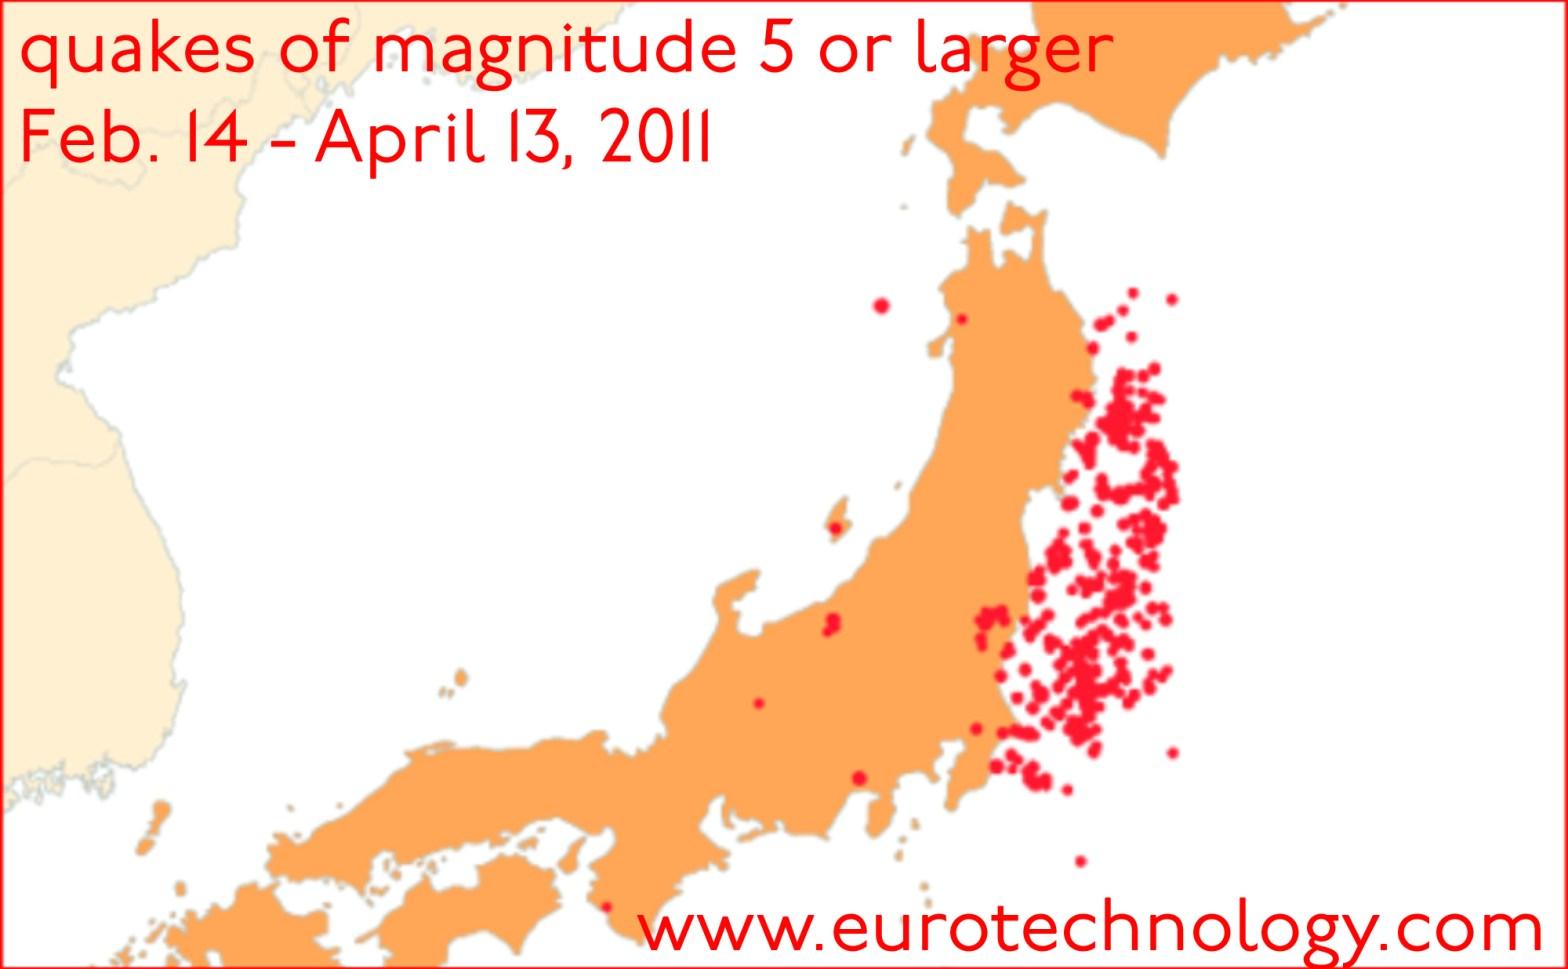 (c) eurotechnology.com